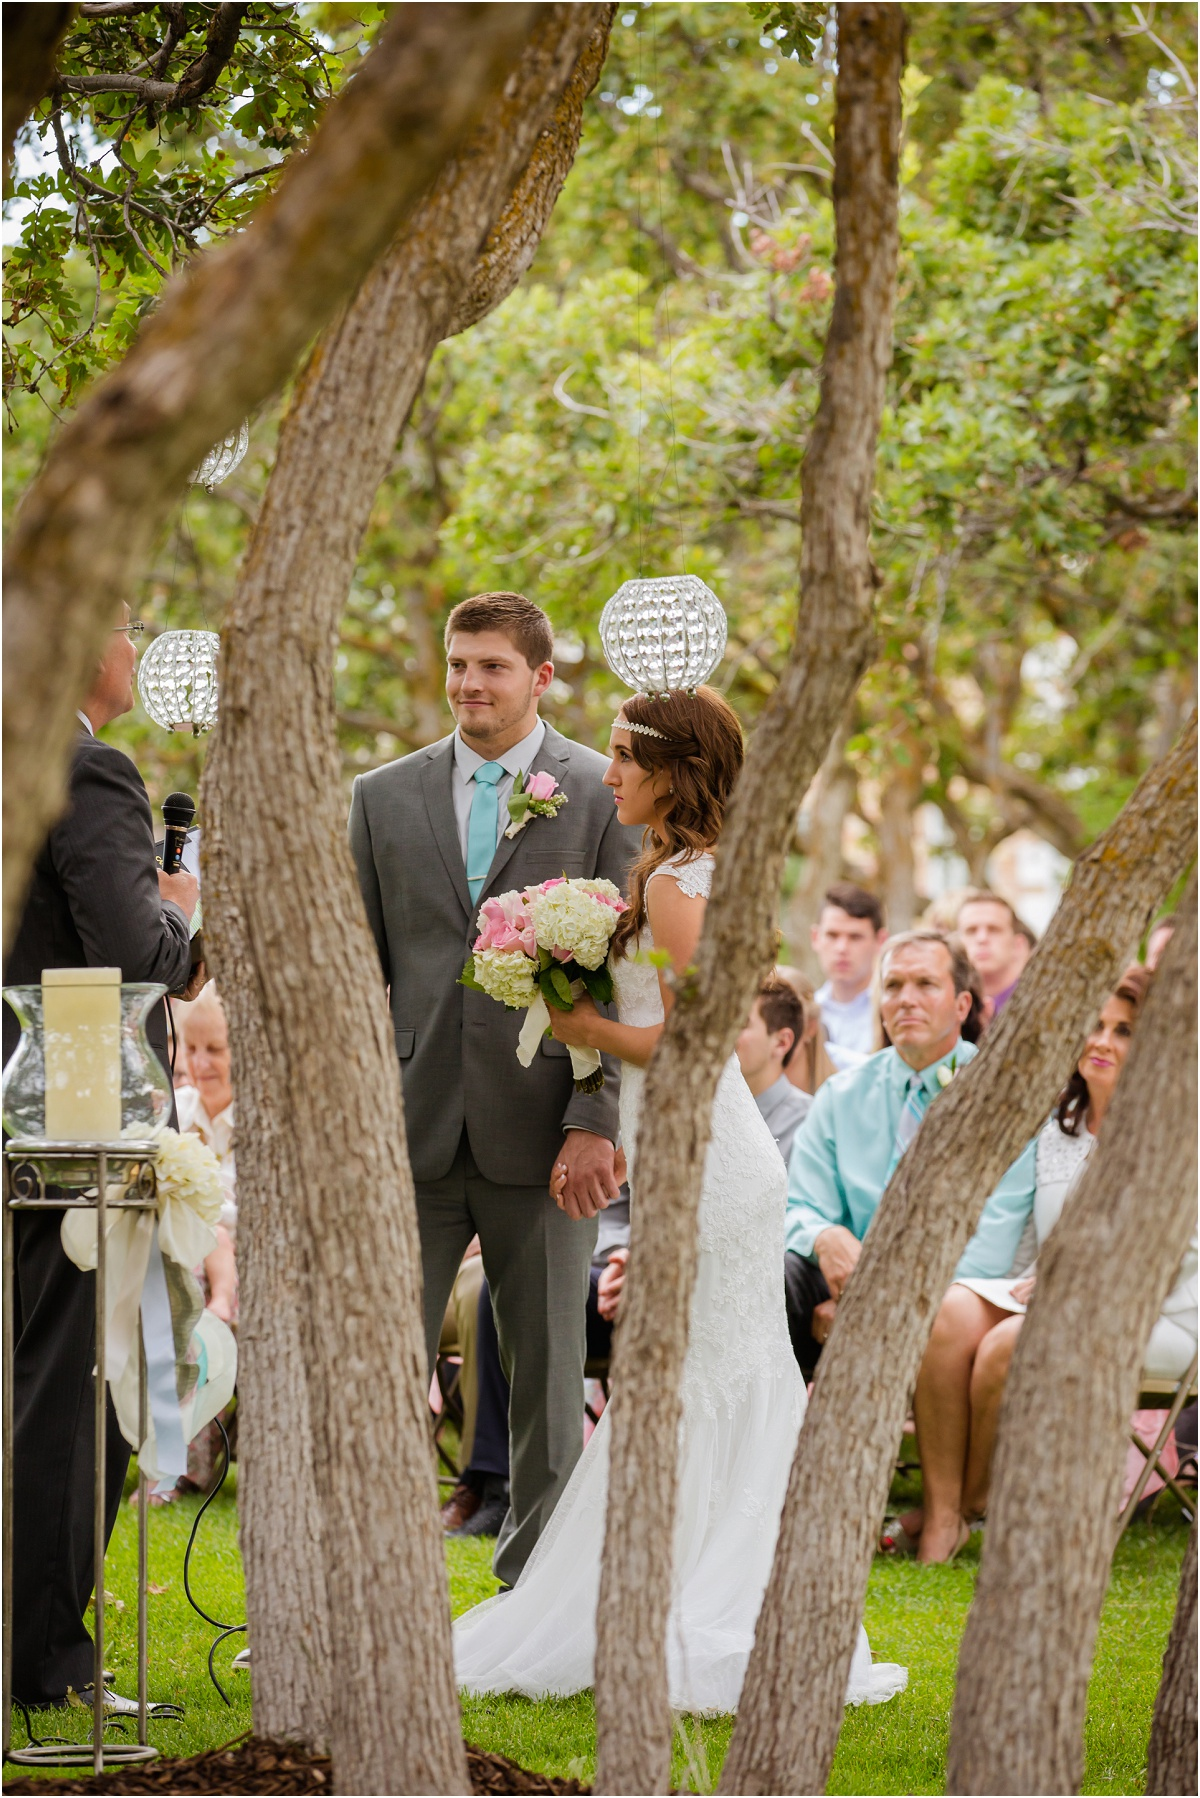 Davis County Private Venue Wedding Terra Cooper Photography_3462.jpg